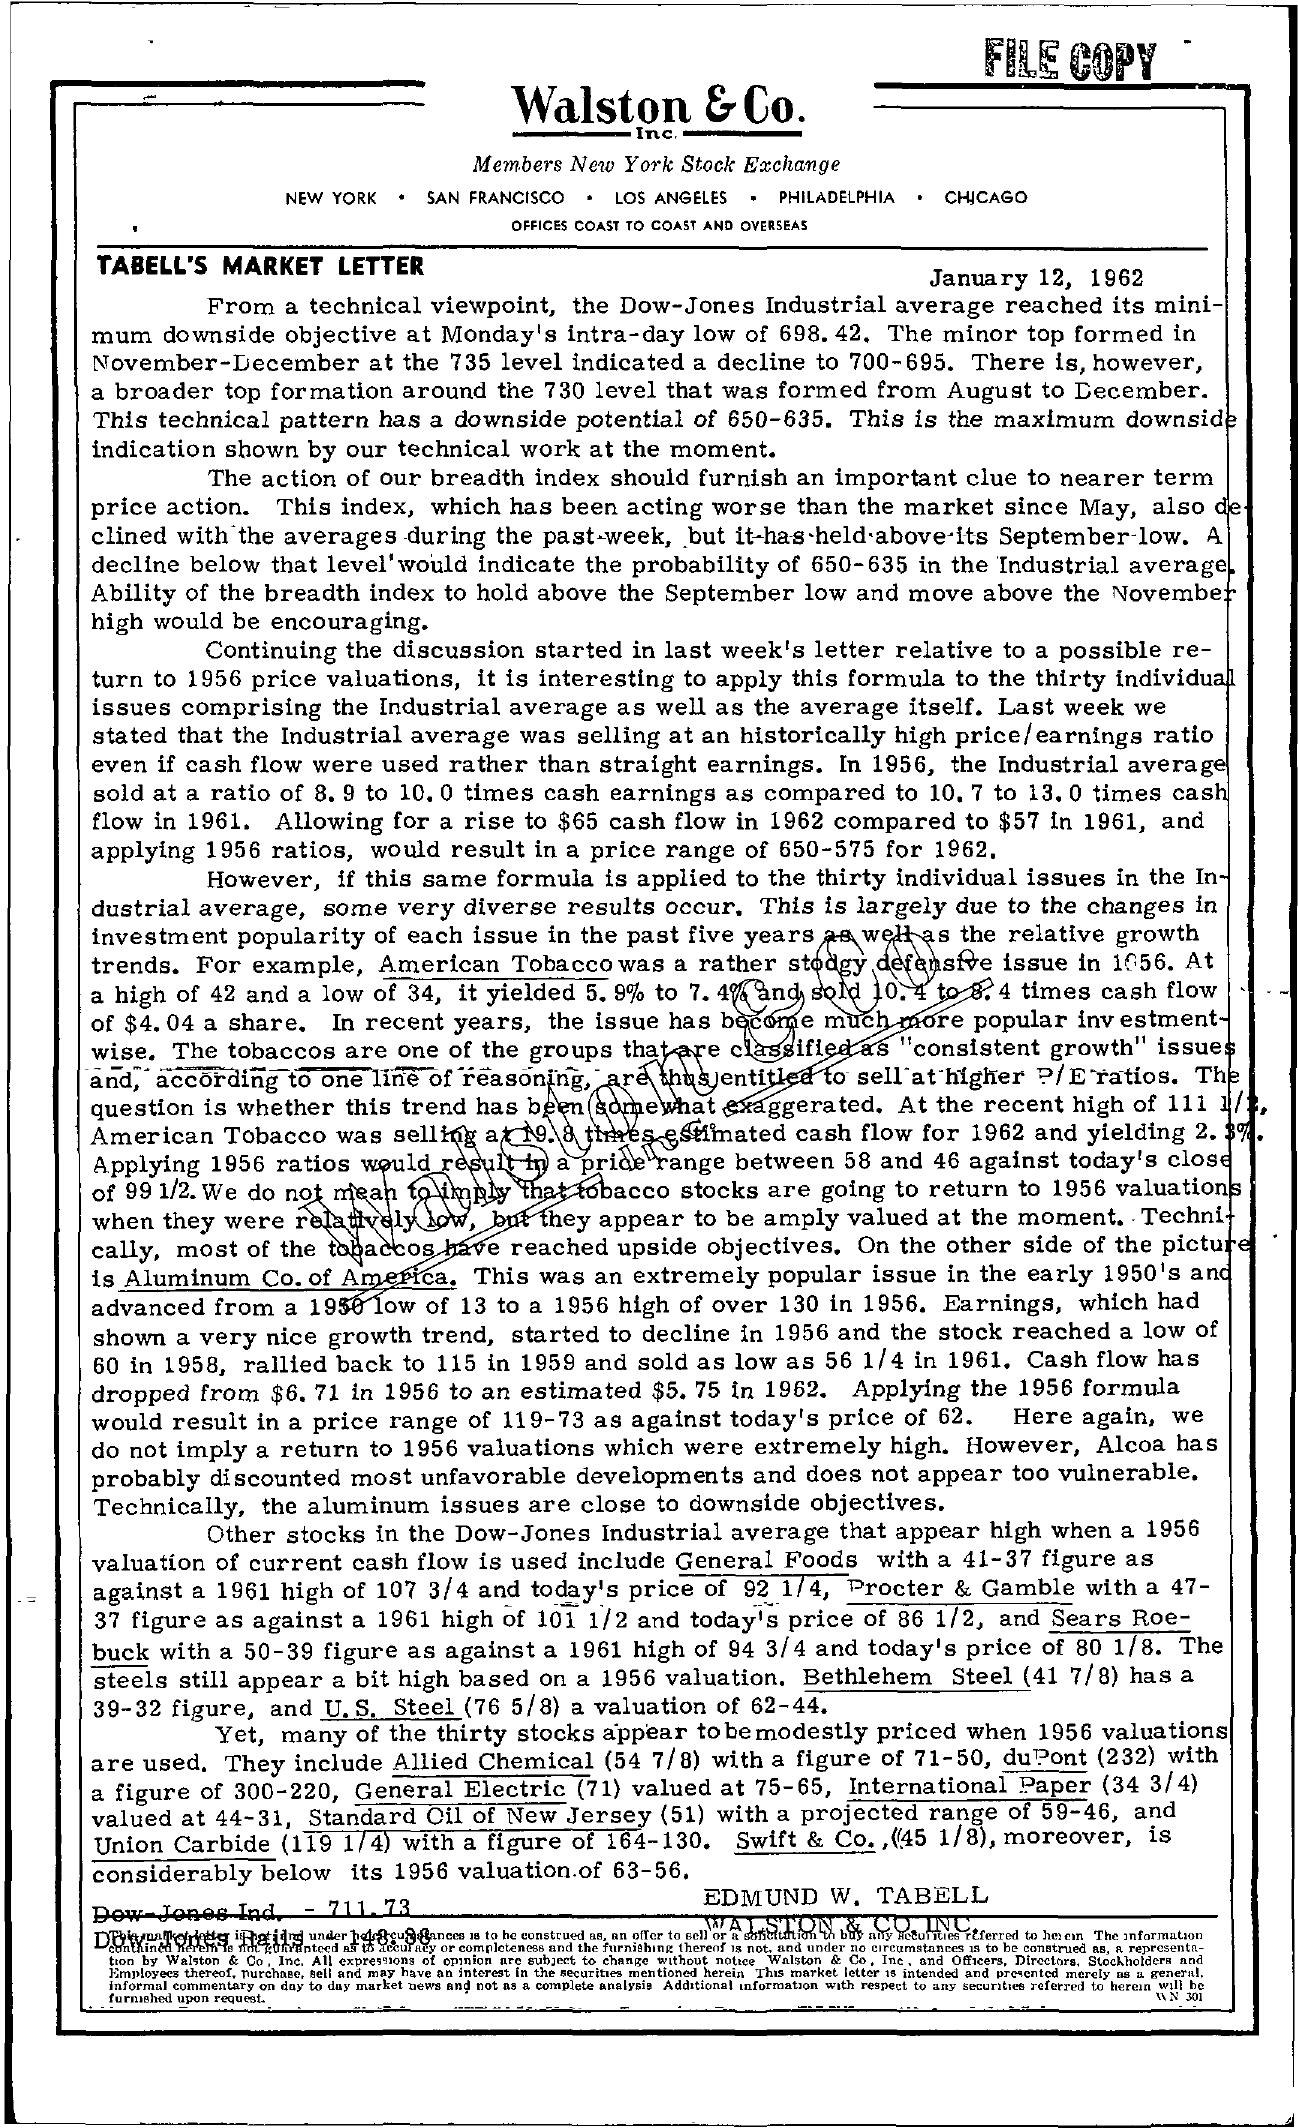 Tabell's Market Letter - January 12, 1962